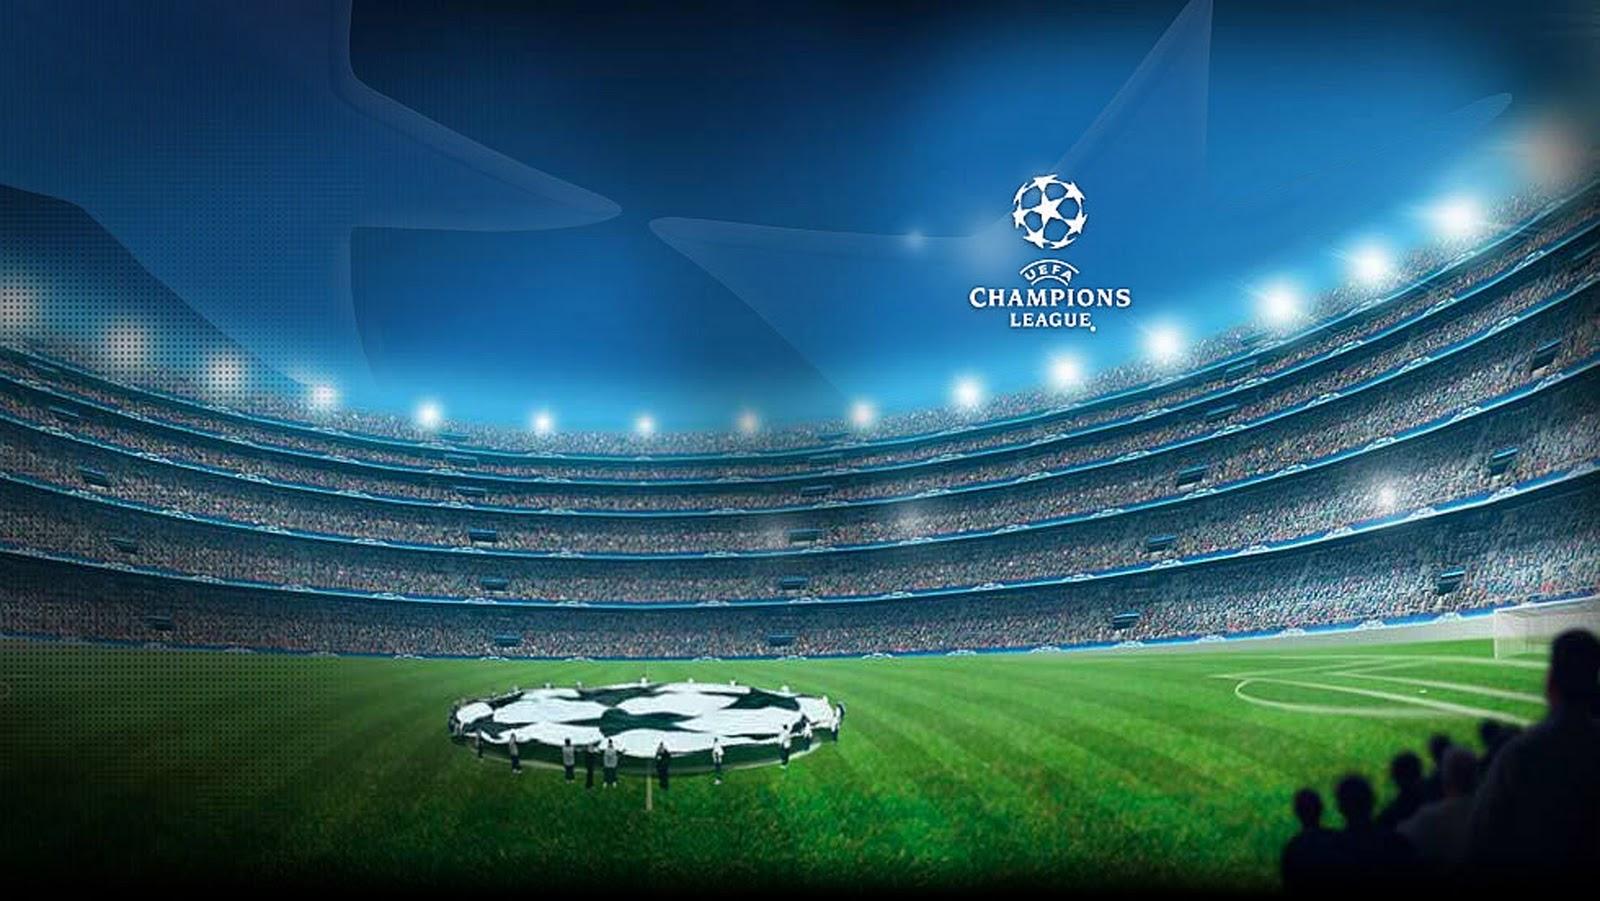 46 uefa champions league wallpaper hd on wallpapersafari 46 uefa champions league wallpaper hd